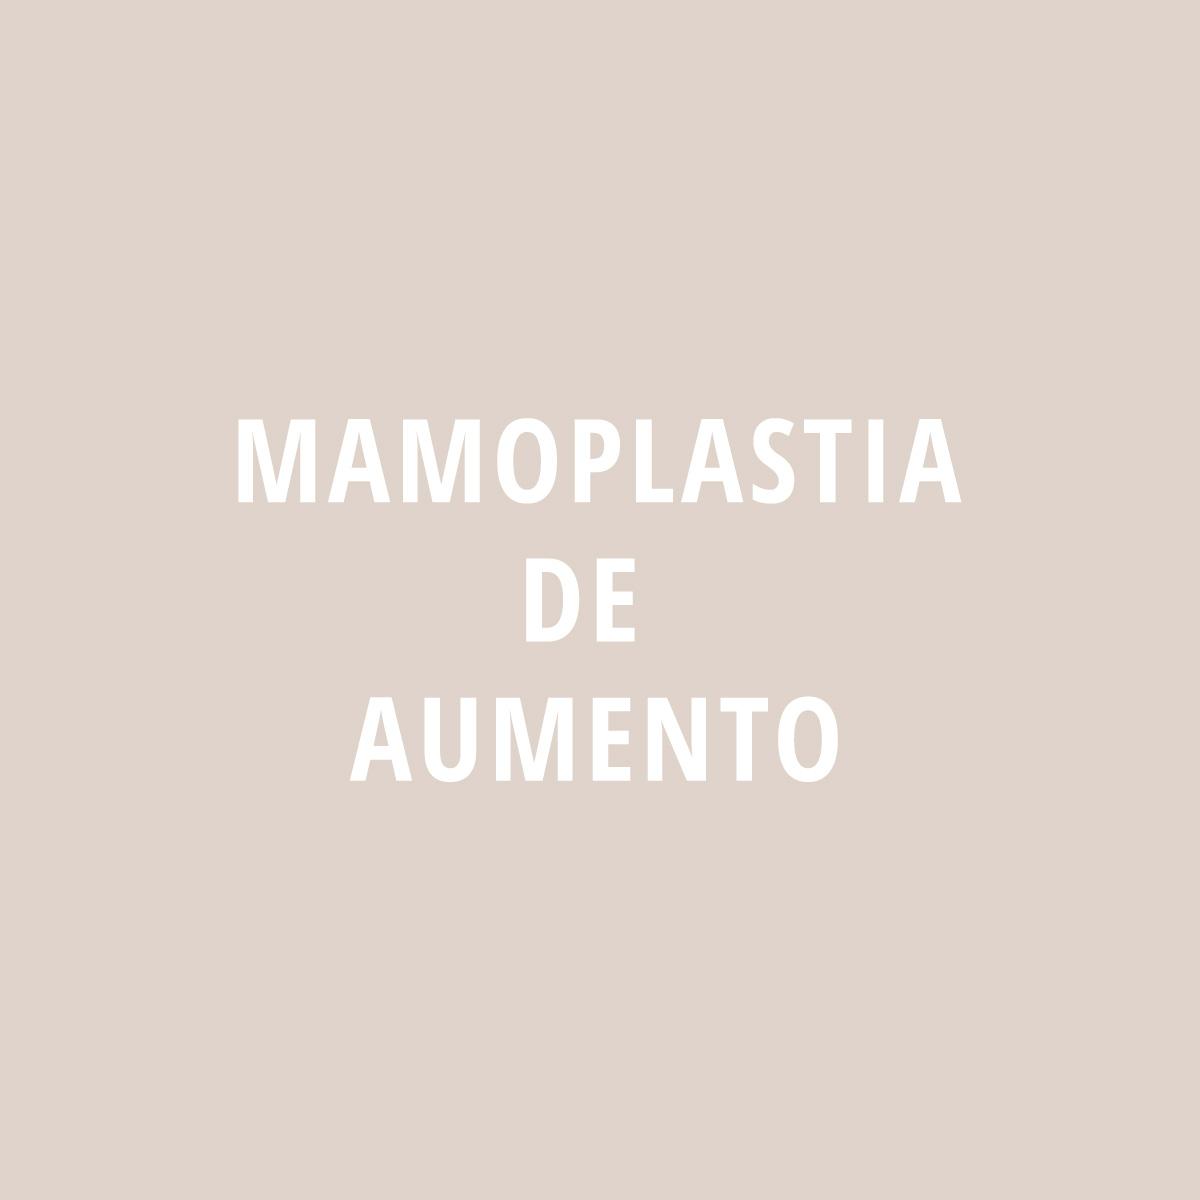 mamoplastia de aumento, cirurgia plástica coimbra